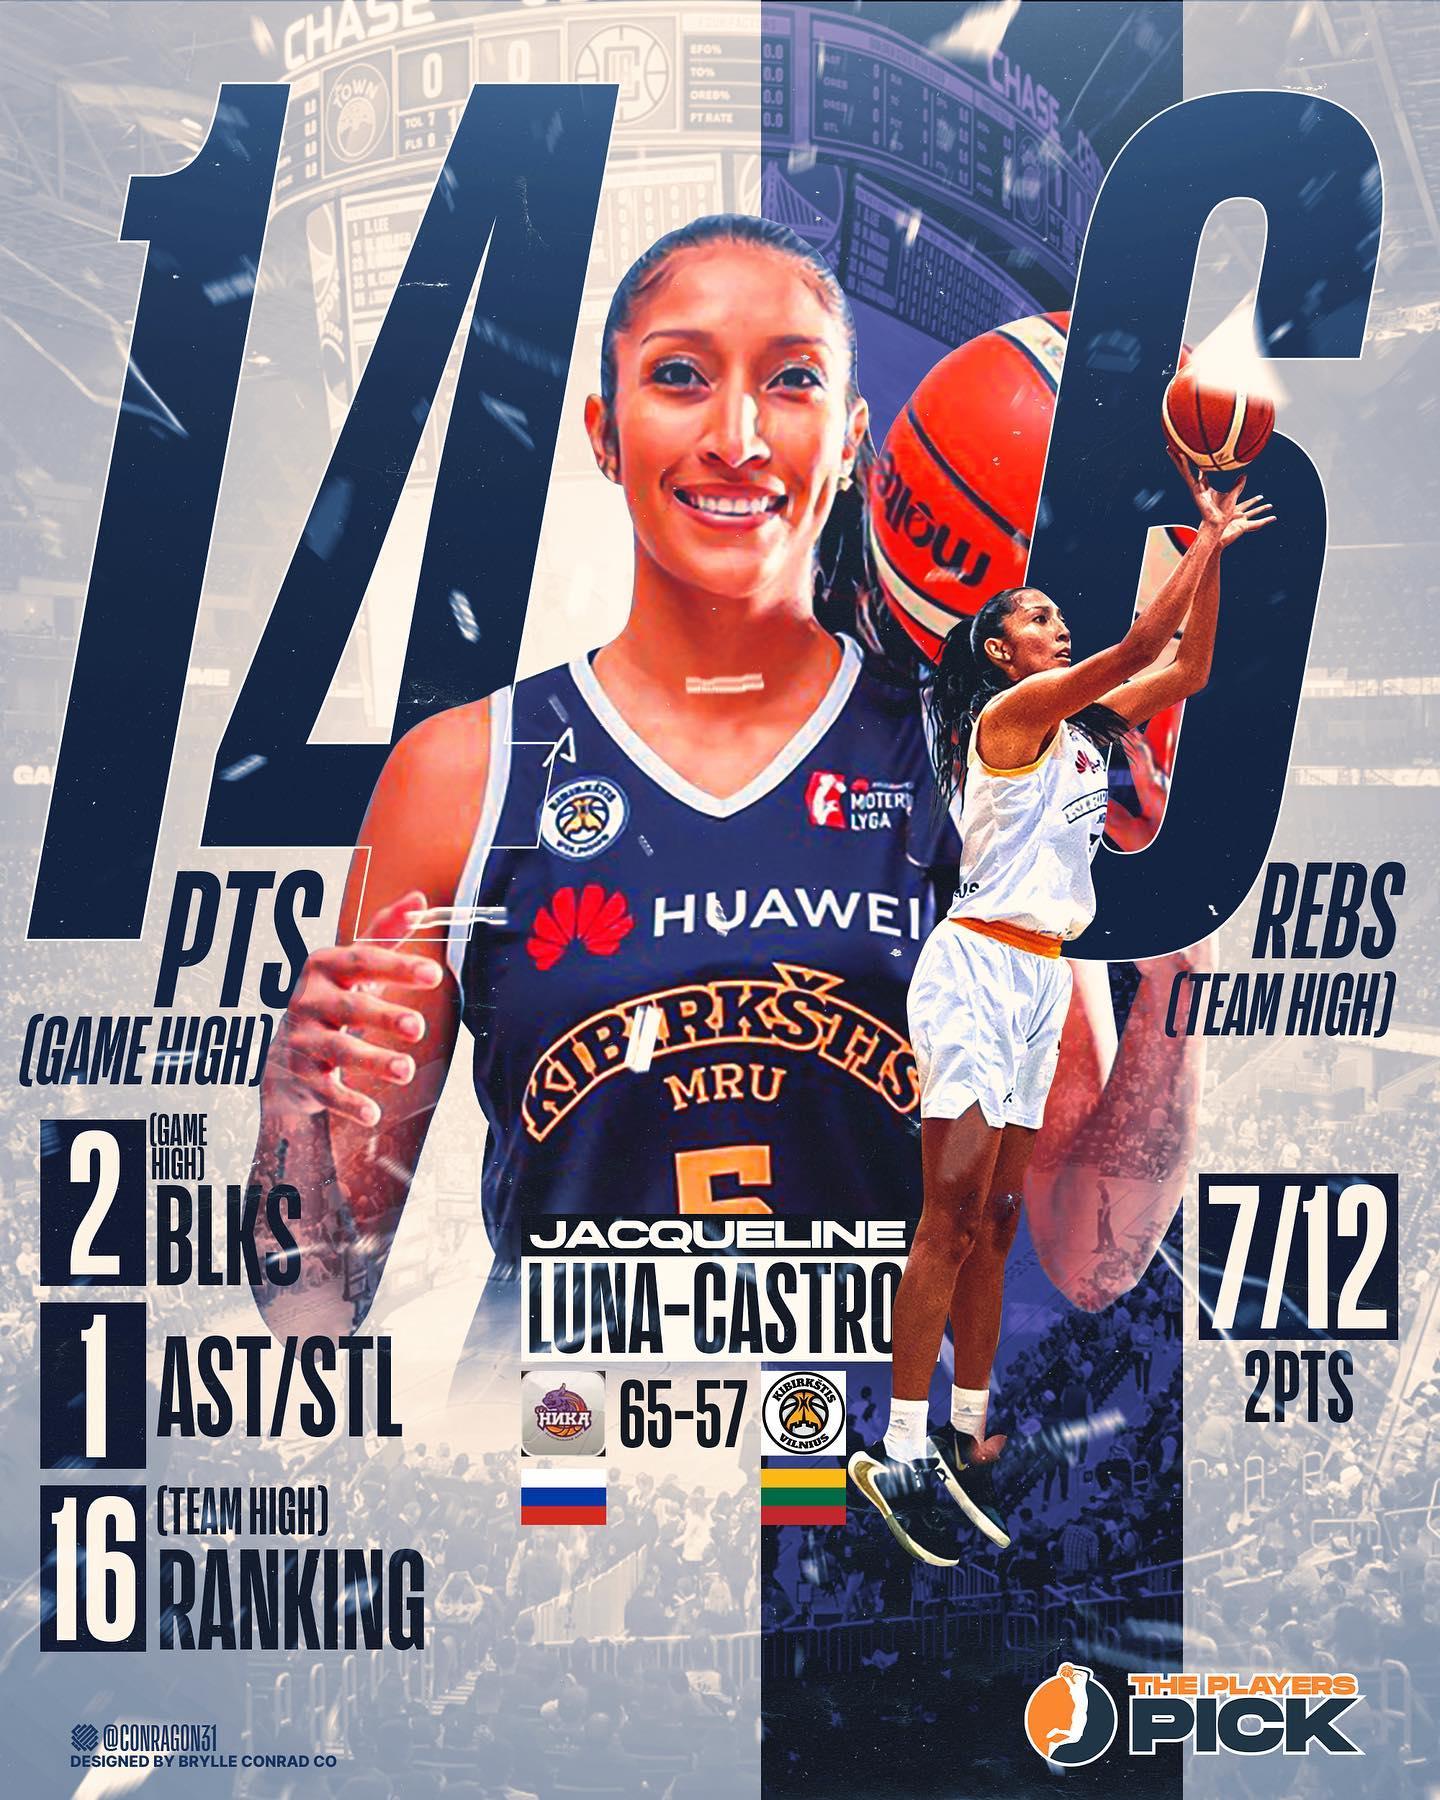 14 points & 6 rebounds vs Russian BC Nika in EWBL for Jackie Luna-Castro!